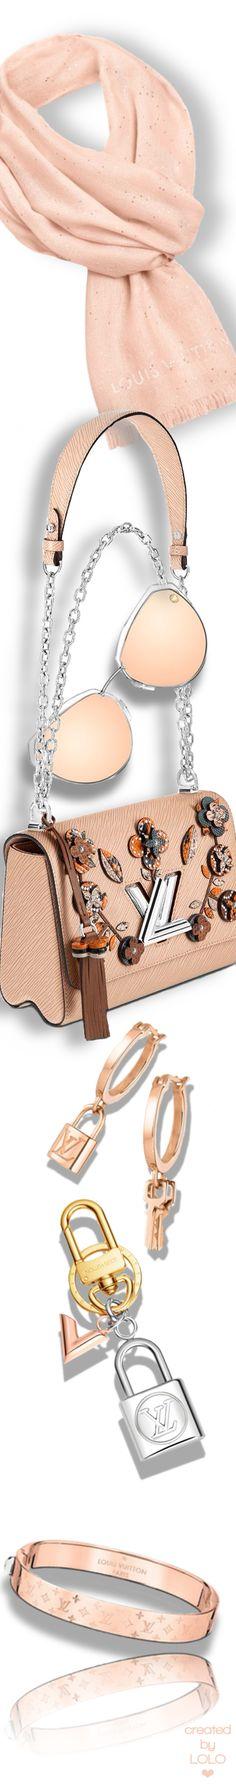 Louis Vuitton Accessories #louisvuitton